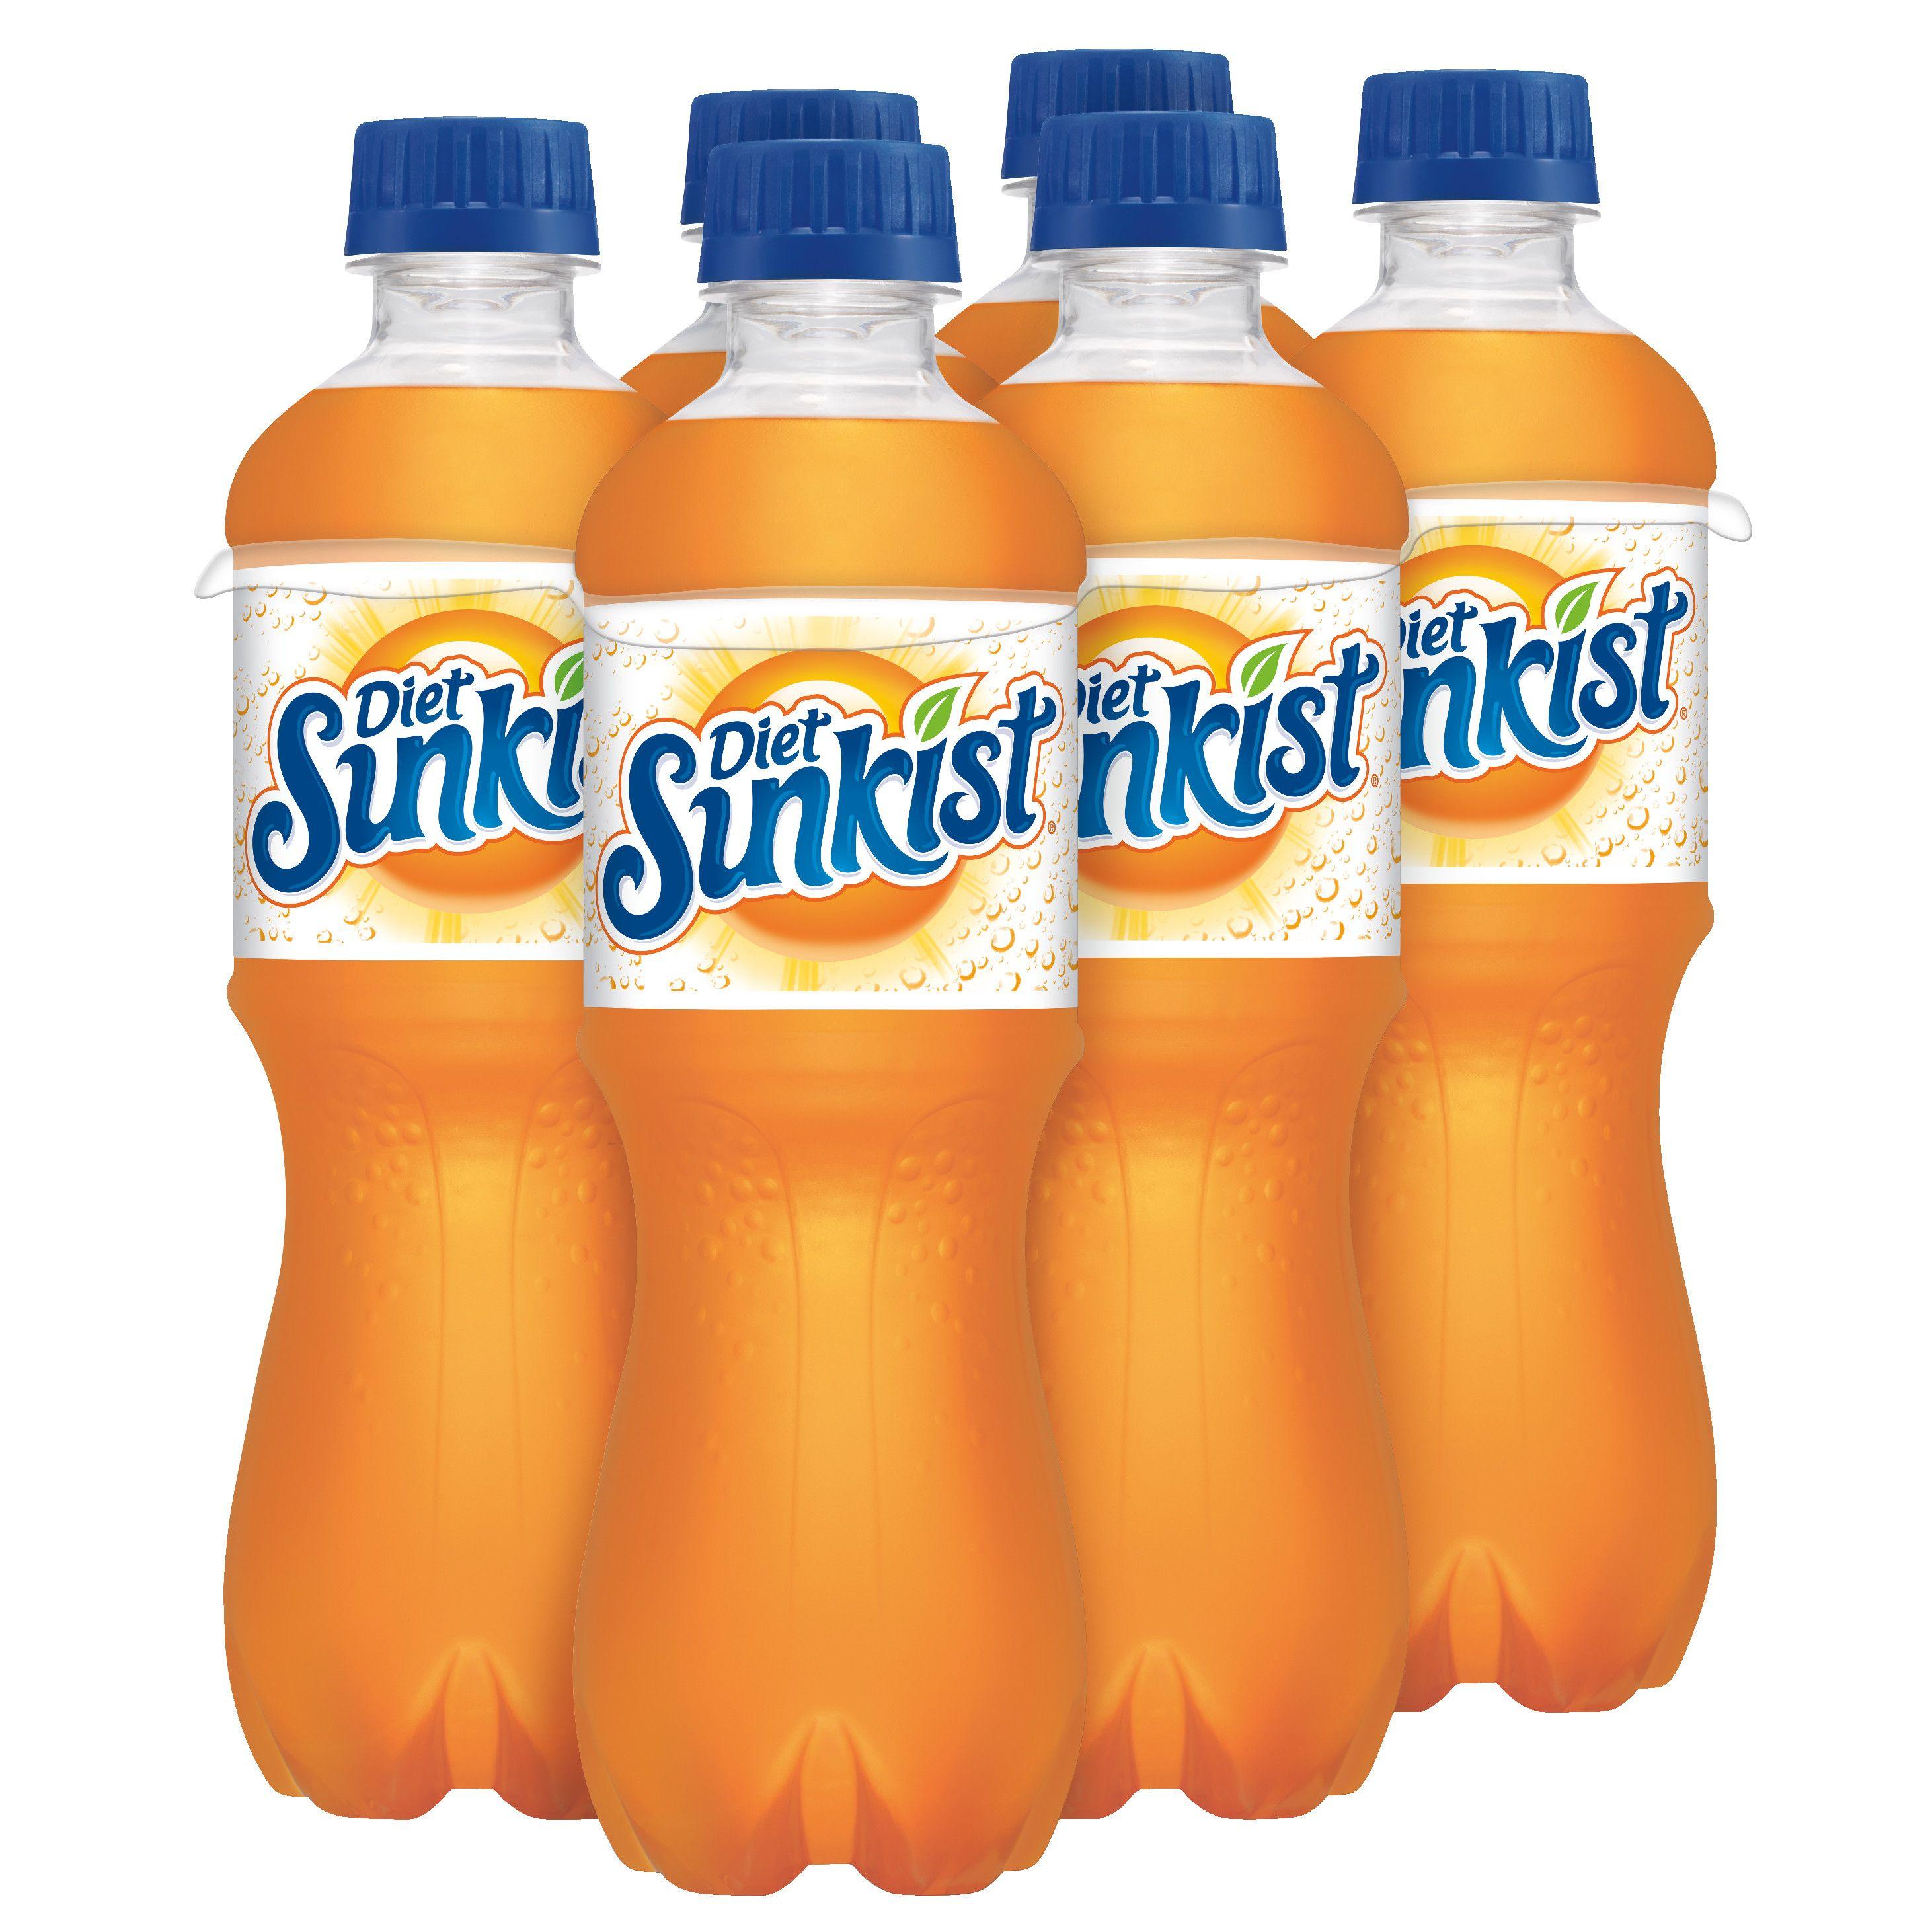 Image result for sunkist diet orange soda bottle diet